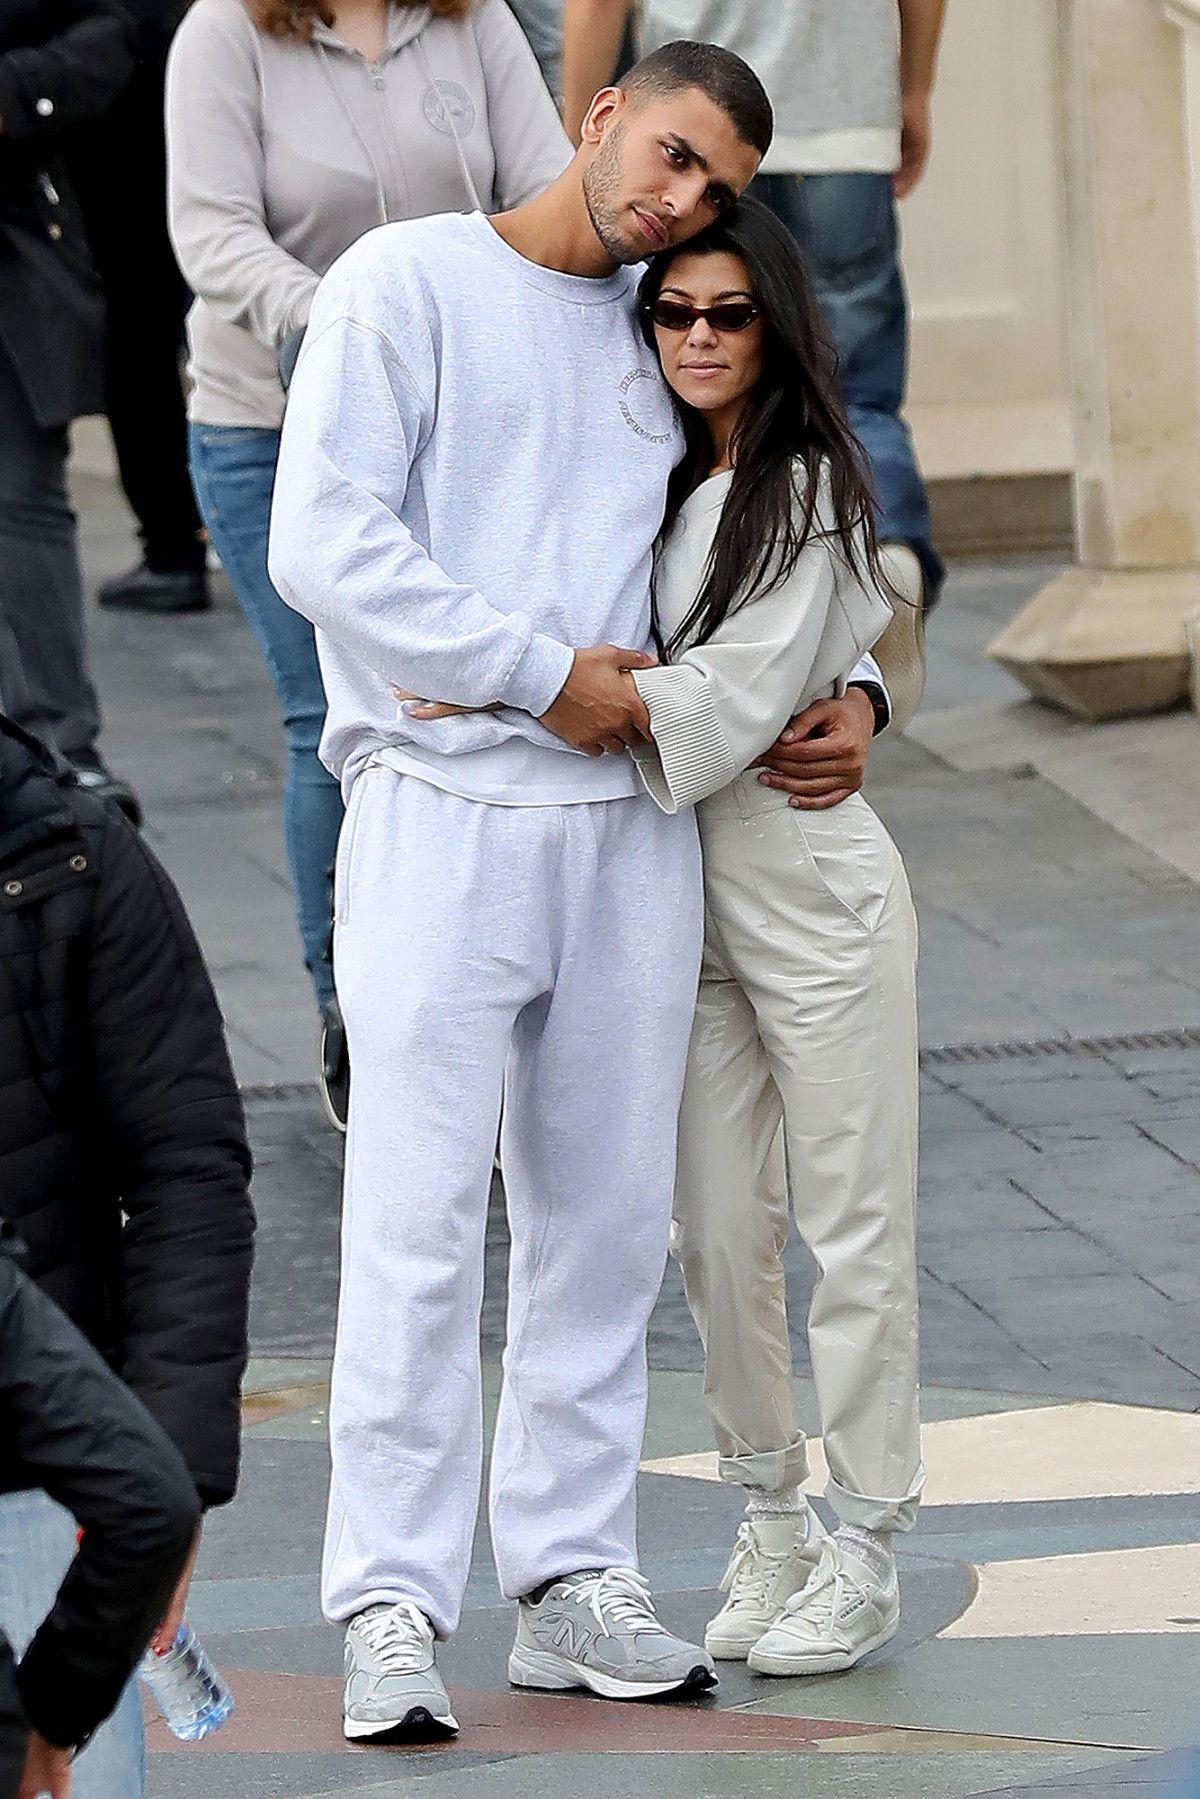 Image result for Kourtney Kardashian and Younes Bendjima